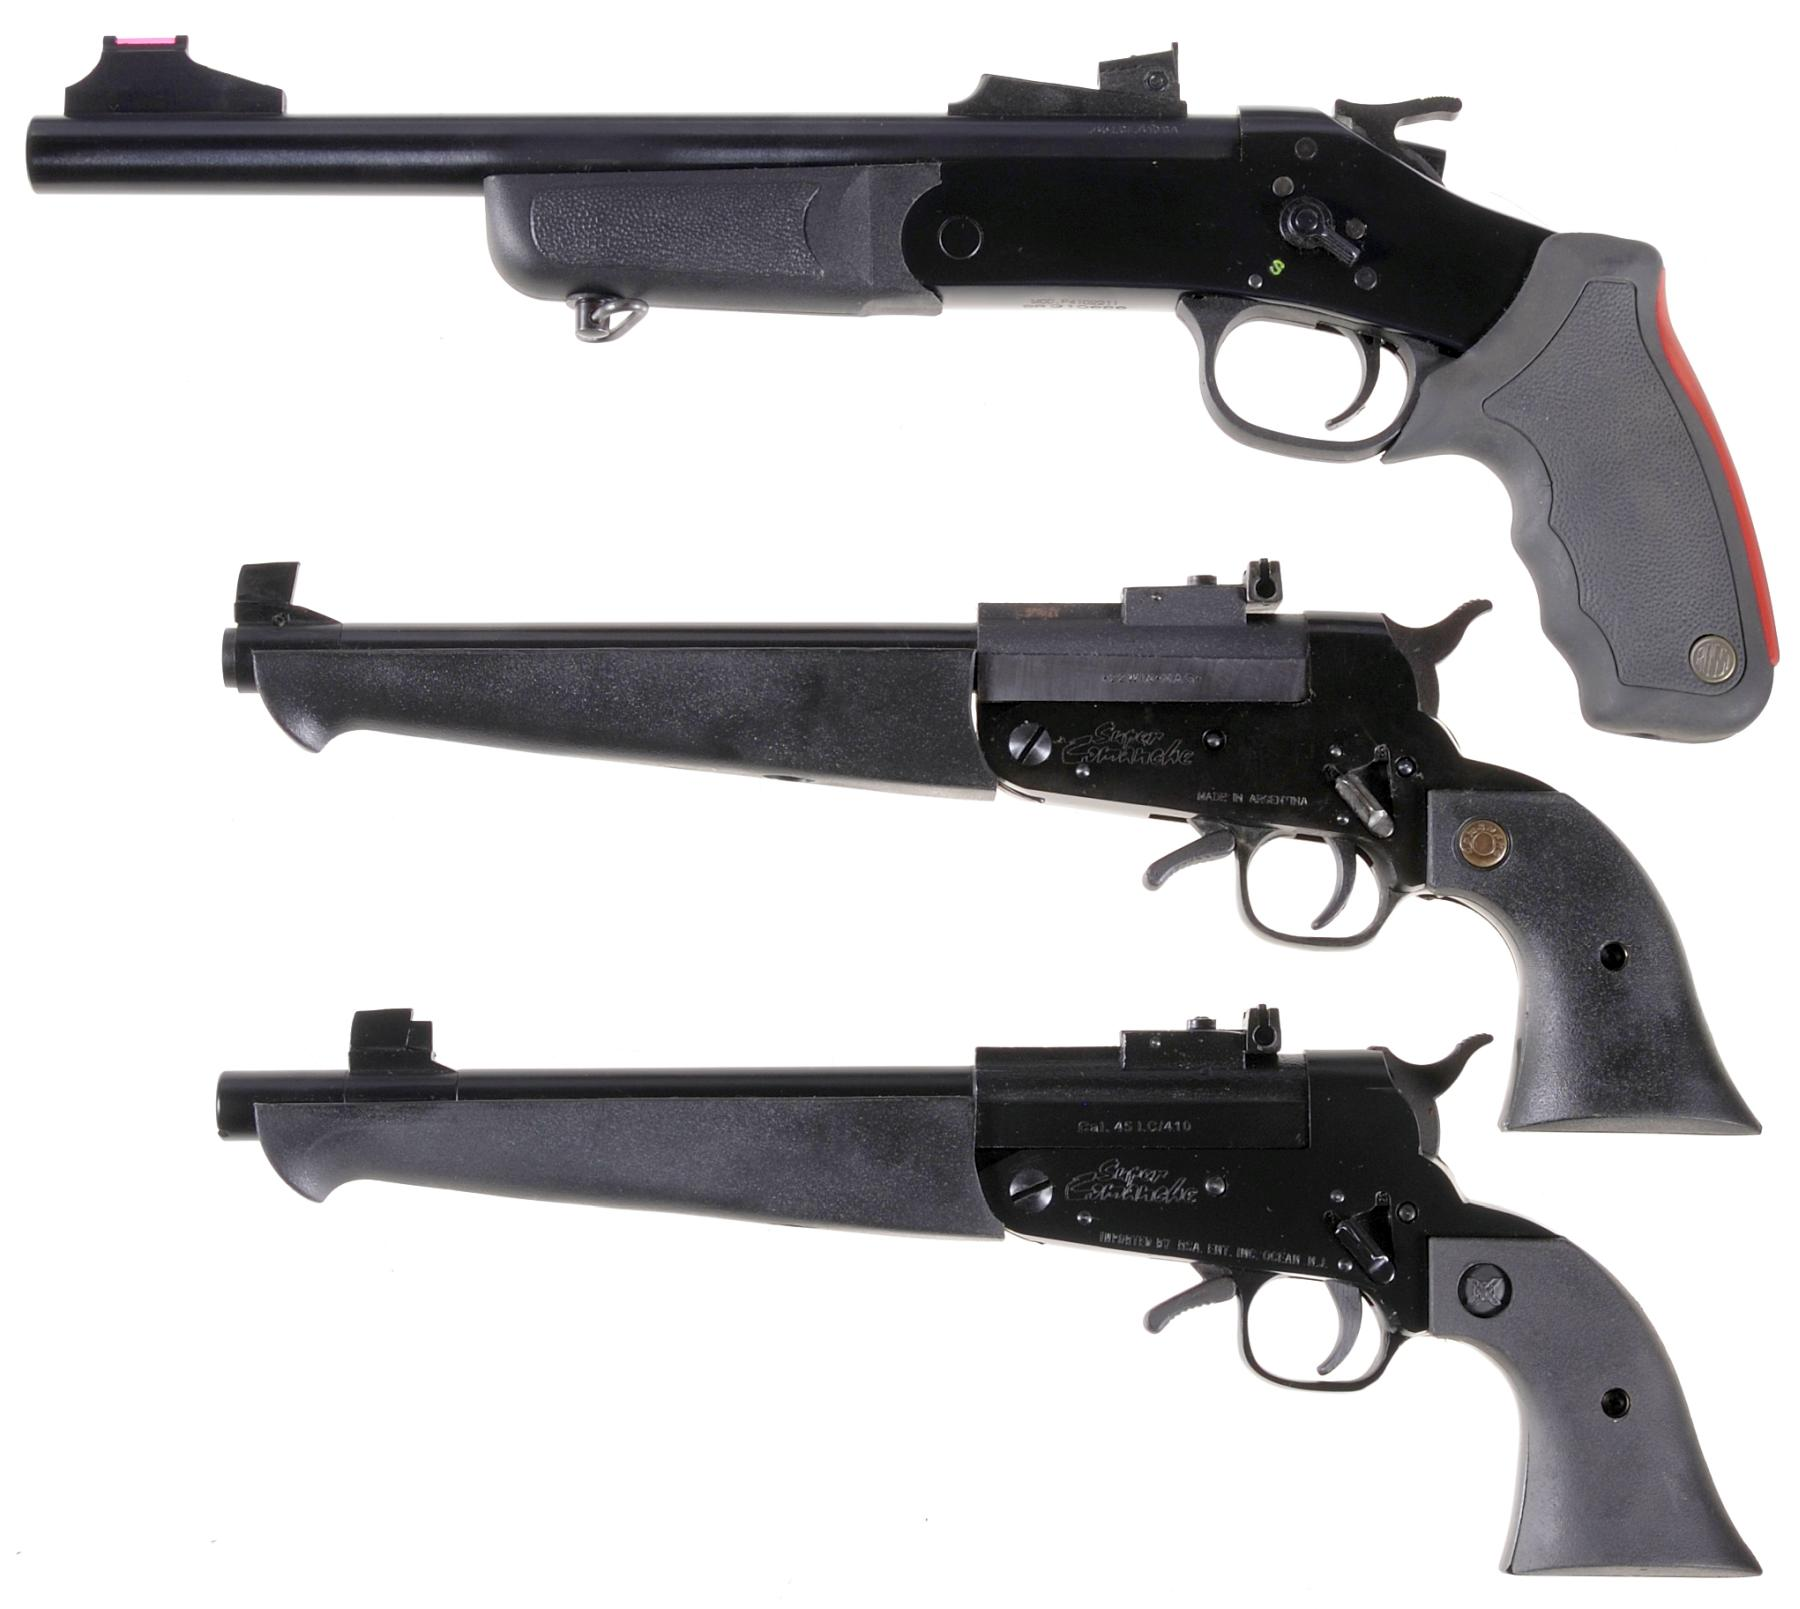 Three Single Shot Pistols -A) Rossi Model P4102211 Pistol